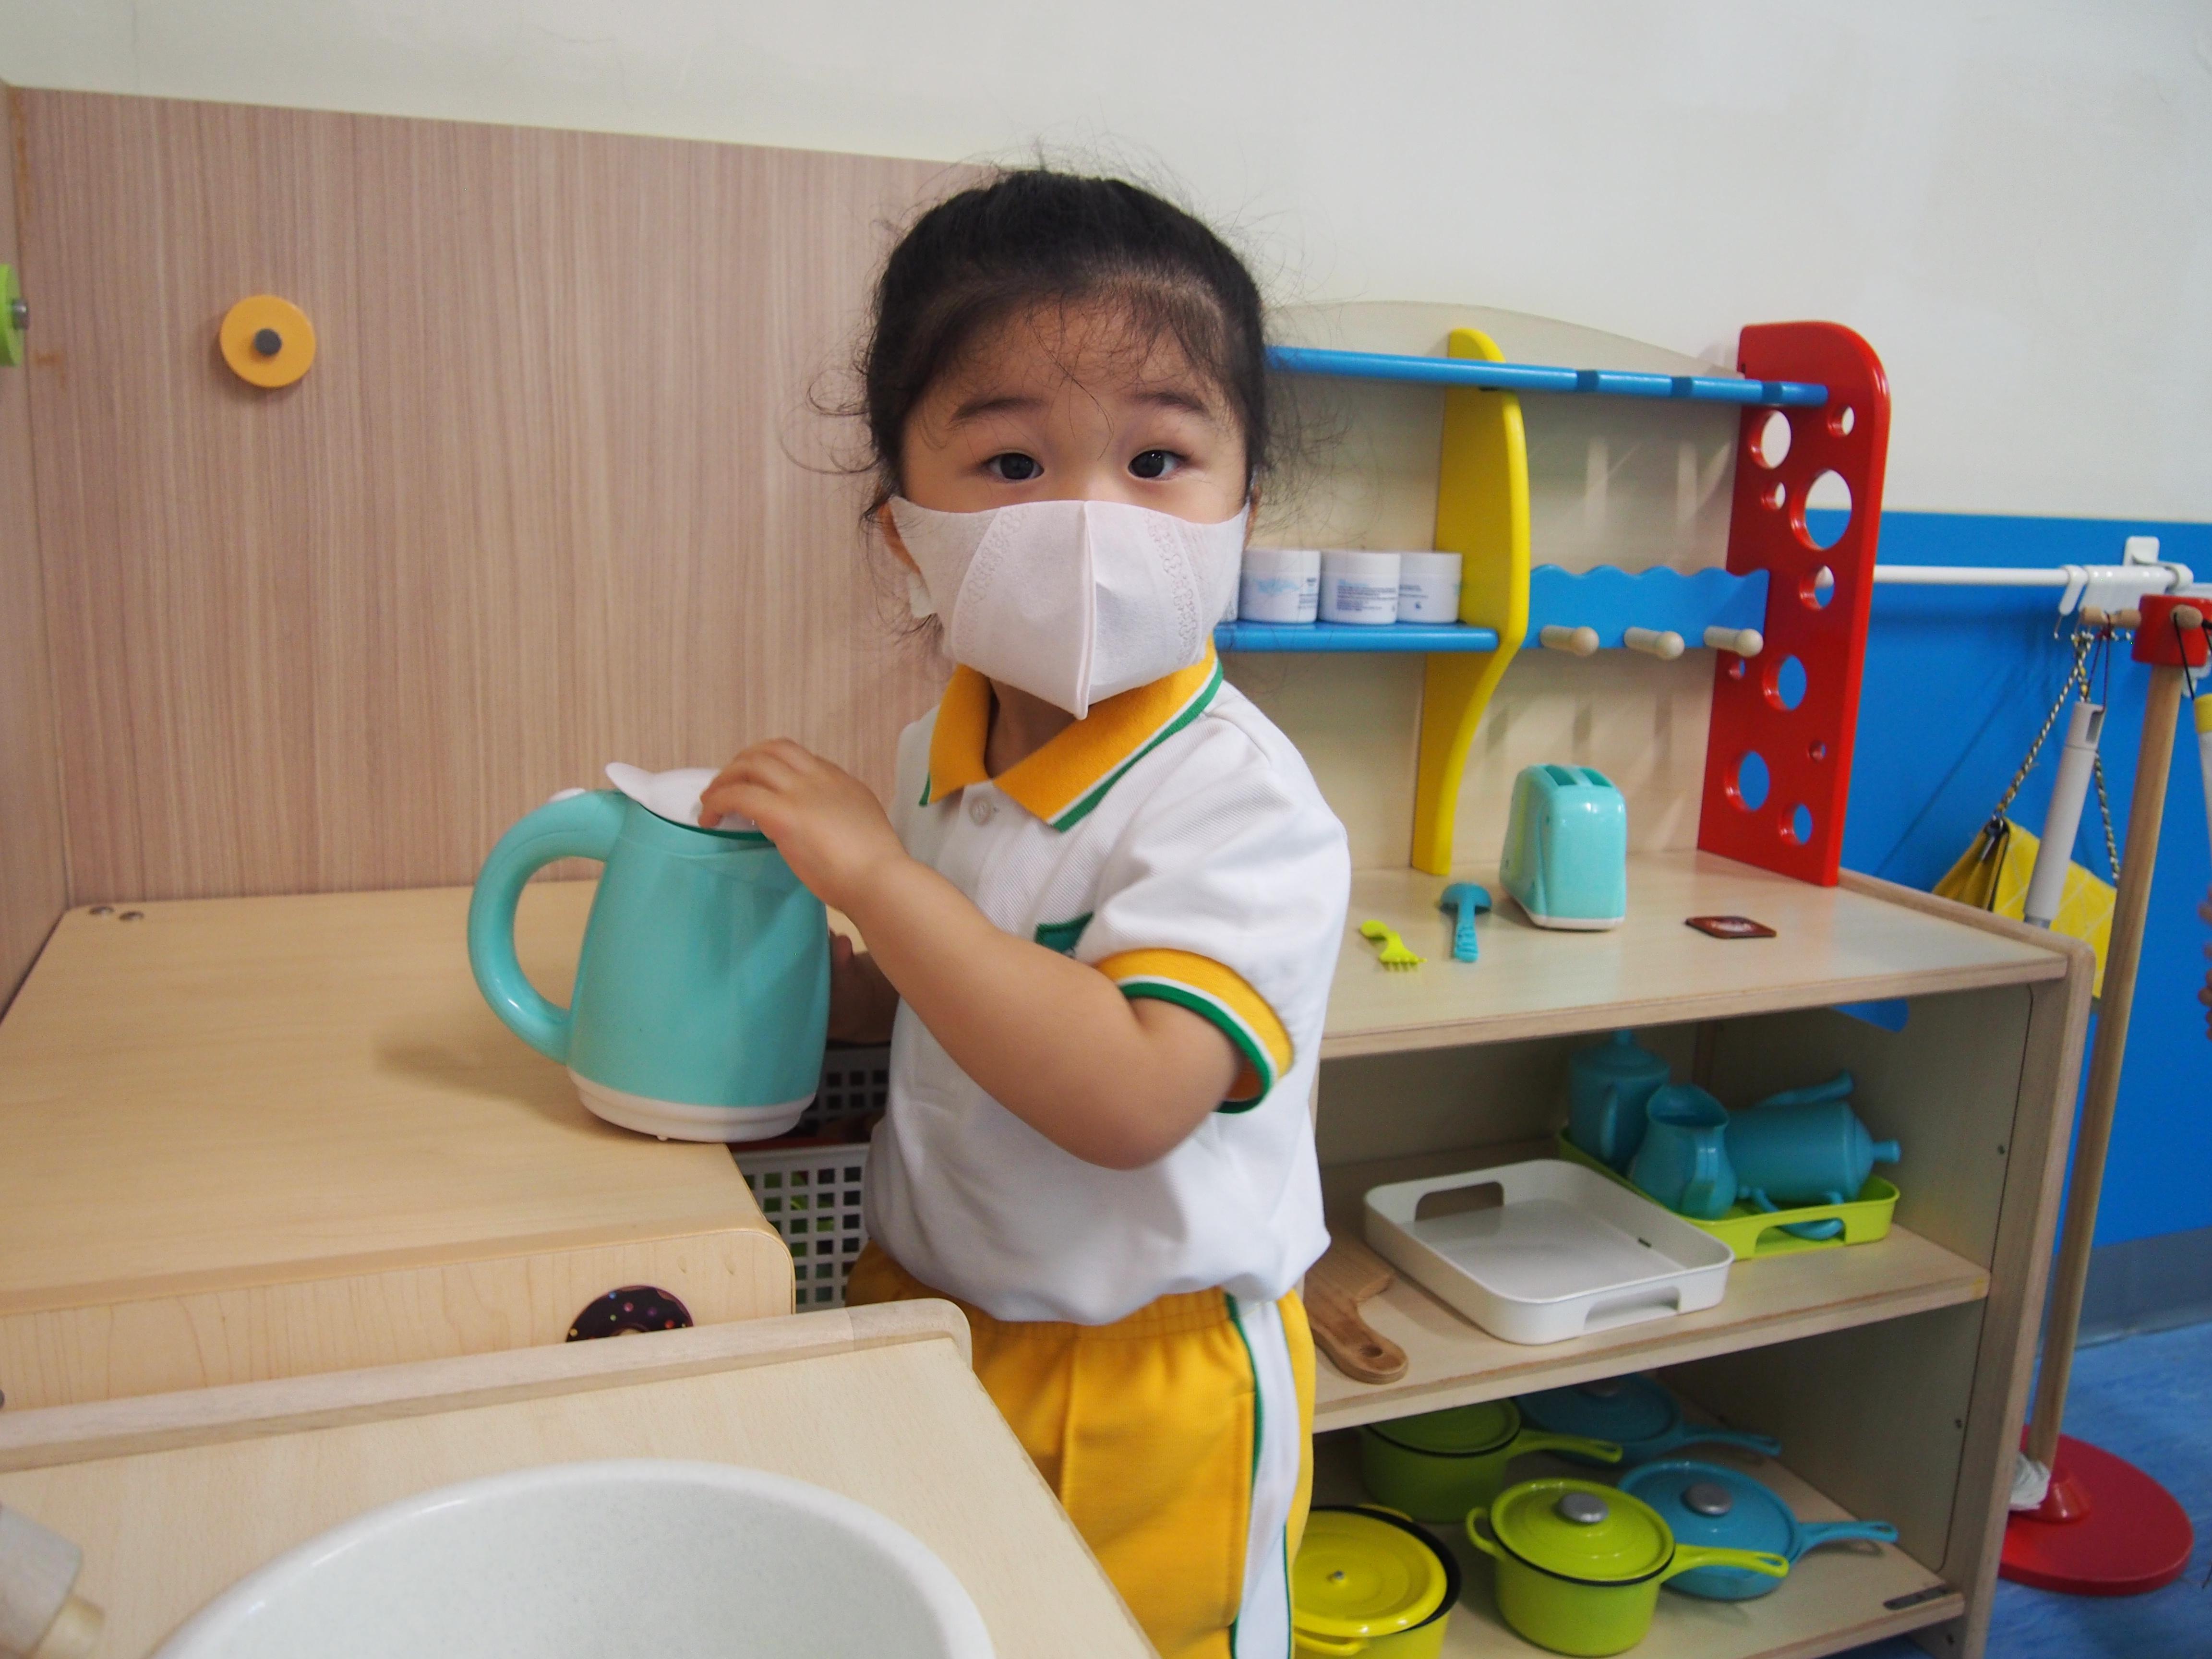 http://npmc.edu.hk/sites/default/files/p1010617.jpg